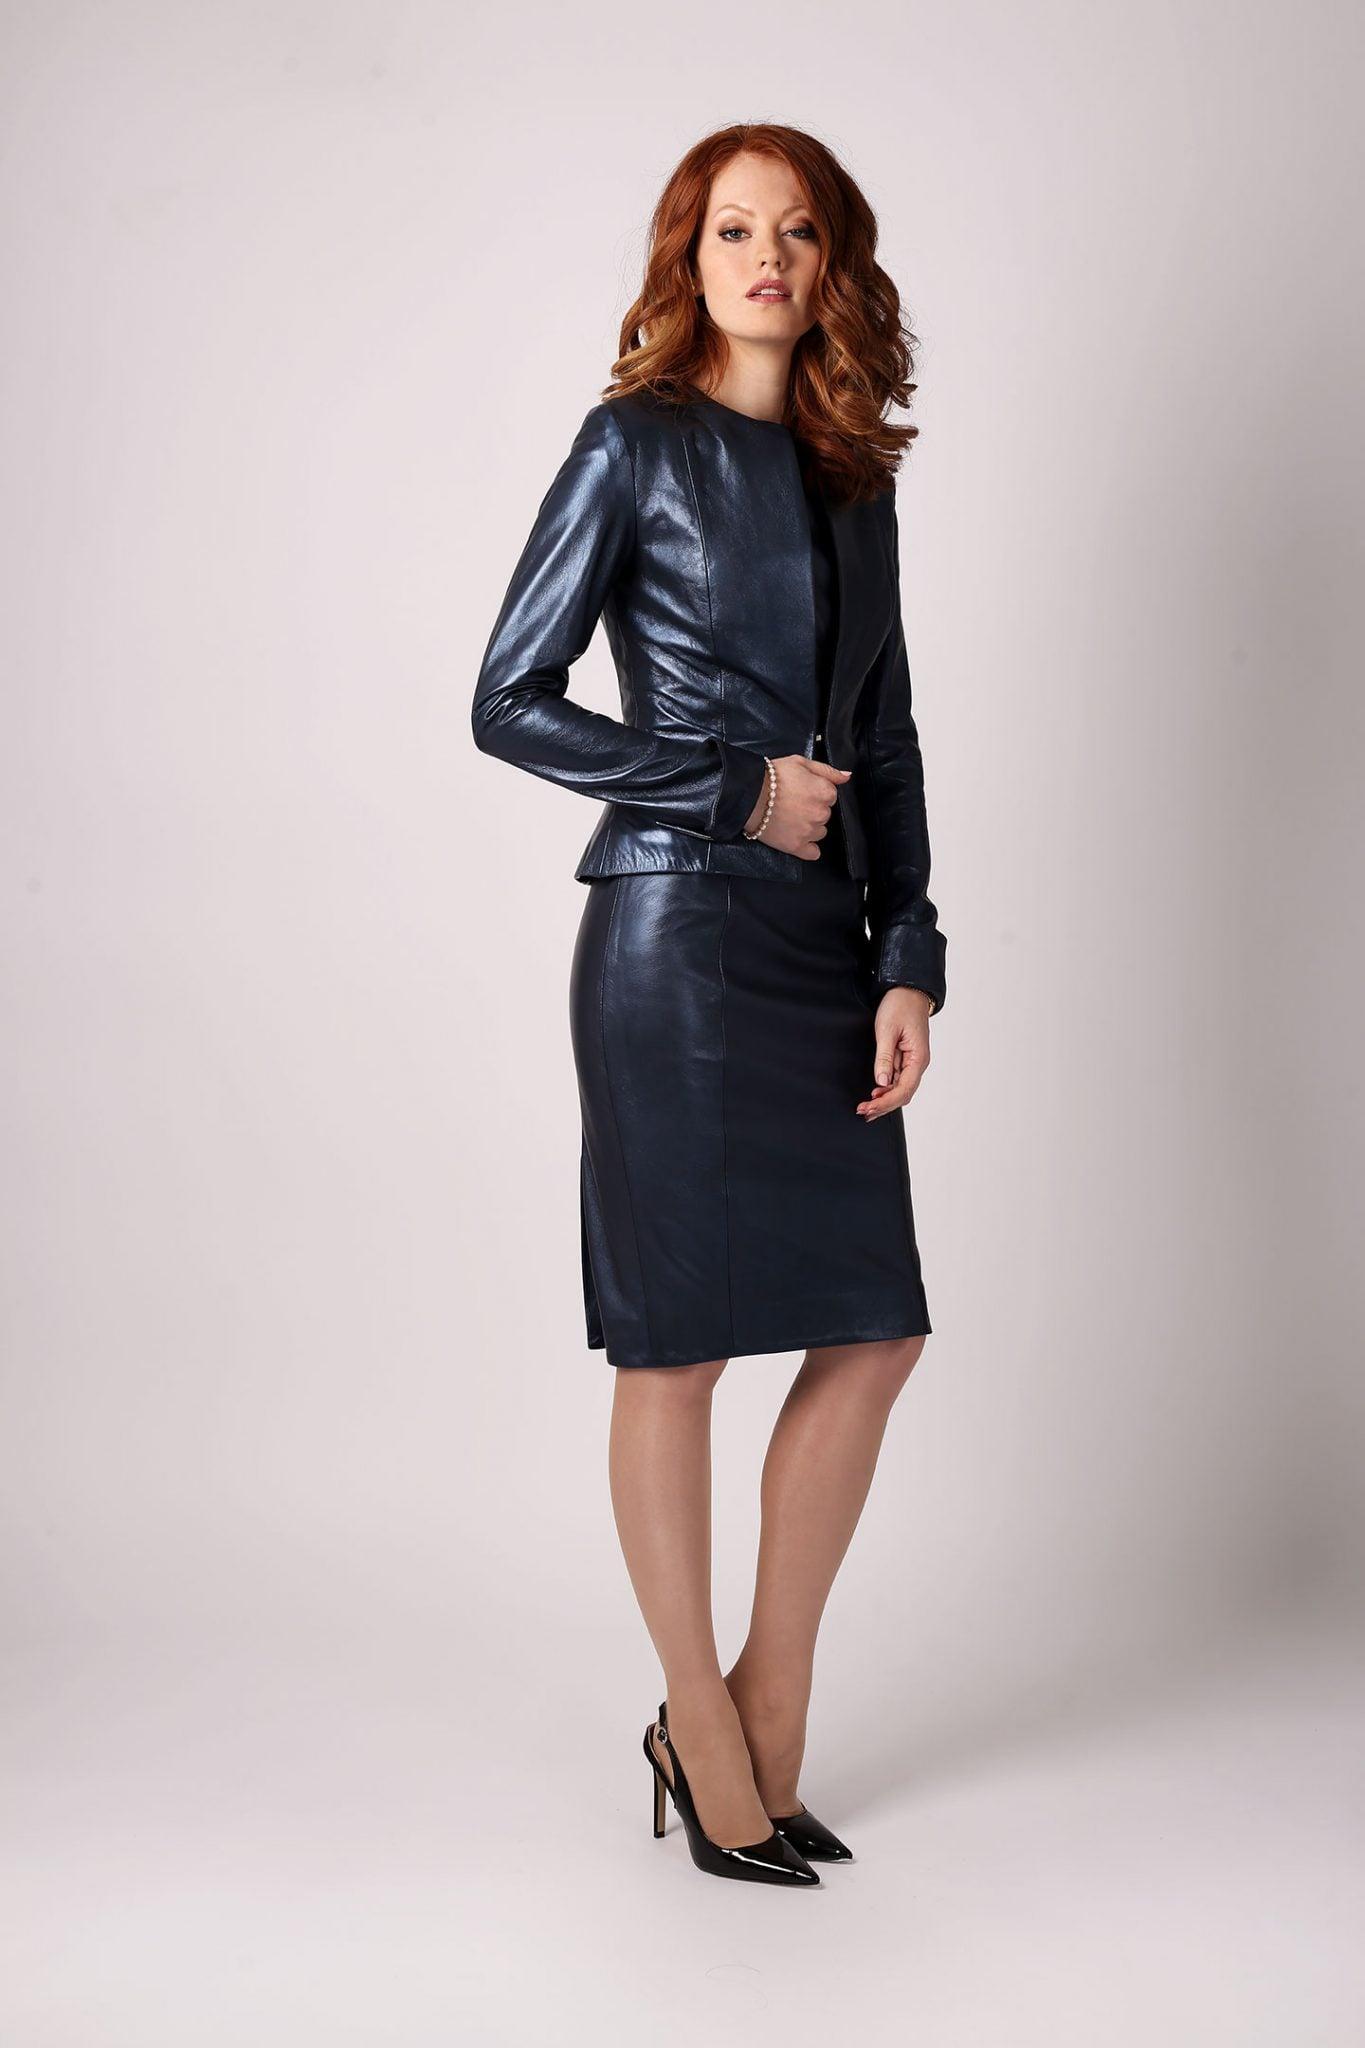 Petrol Blue Metallic Leather Dress2